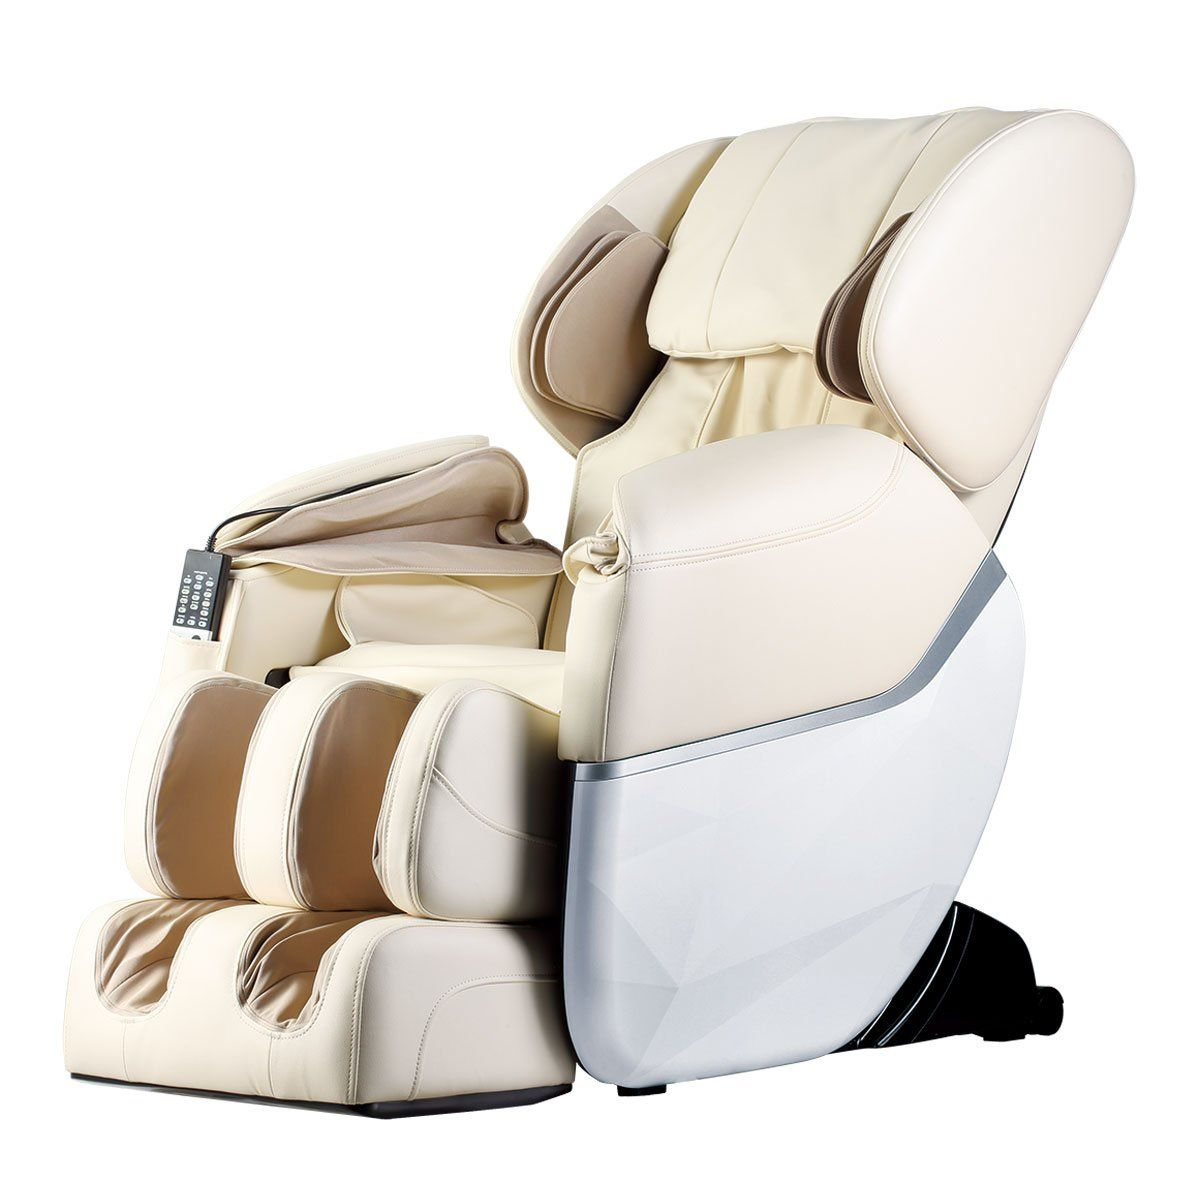 Mr Direct New Electric Full Body Shiatsu Massage Chair Recliner Zero Gravity W Heat Massage Chair Shiatsu Massage Chair Feet Roller